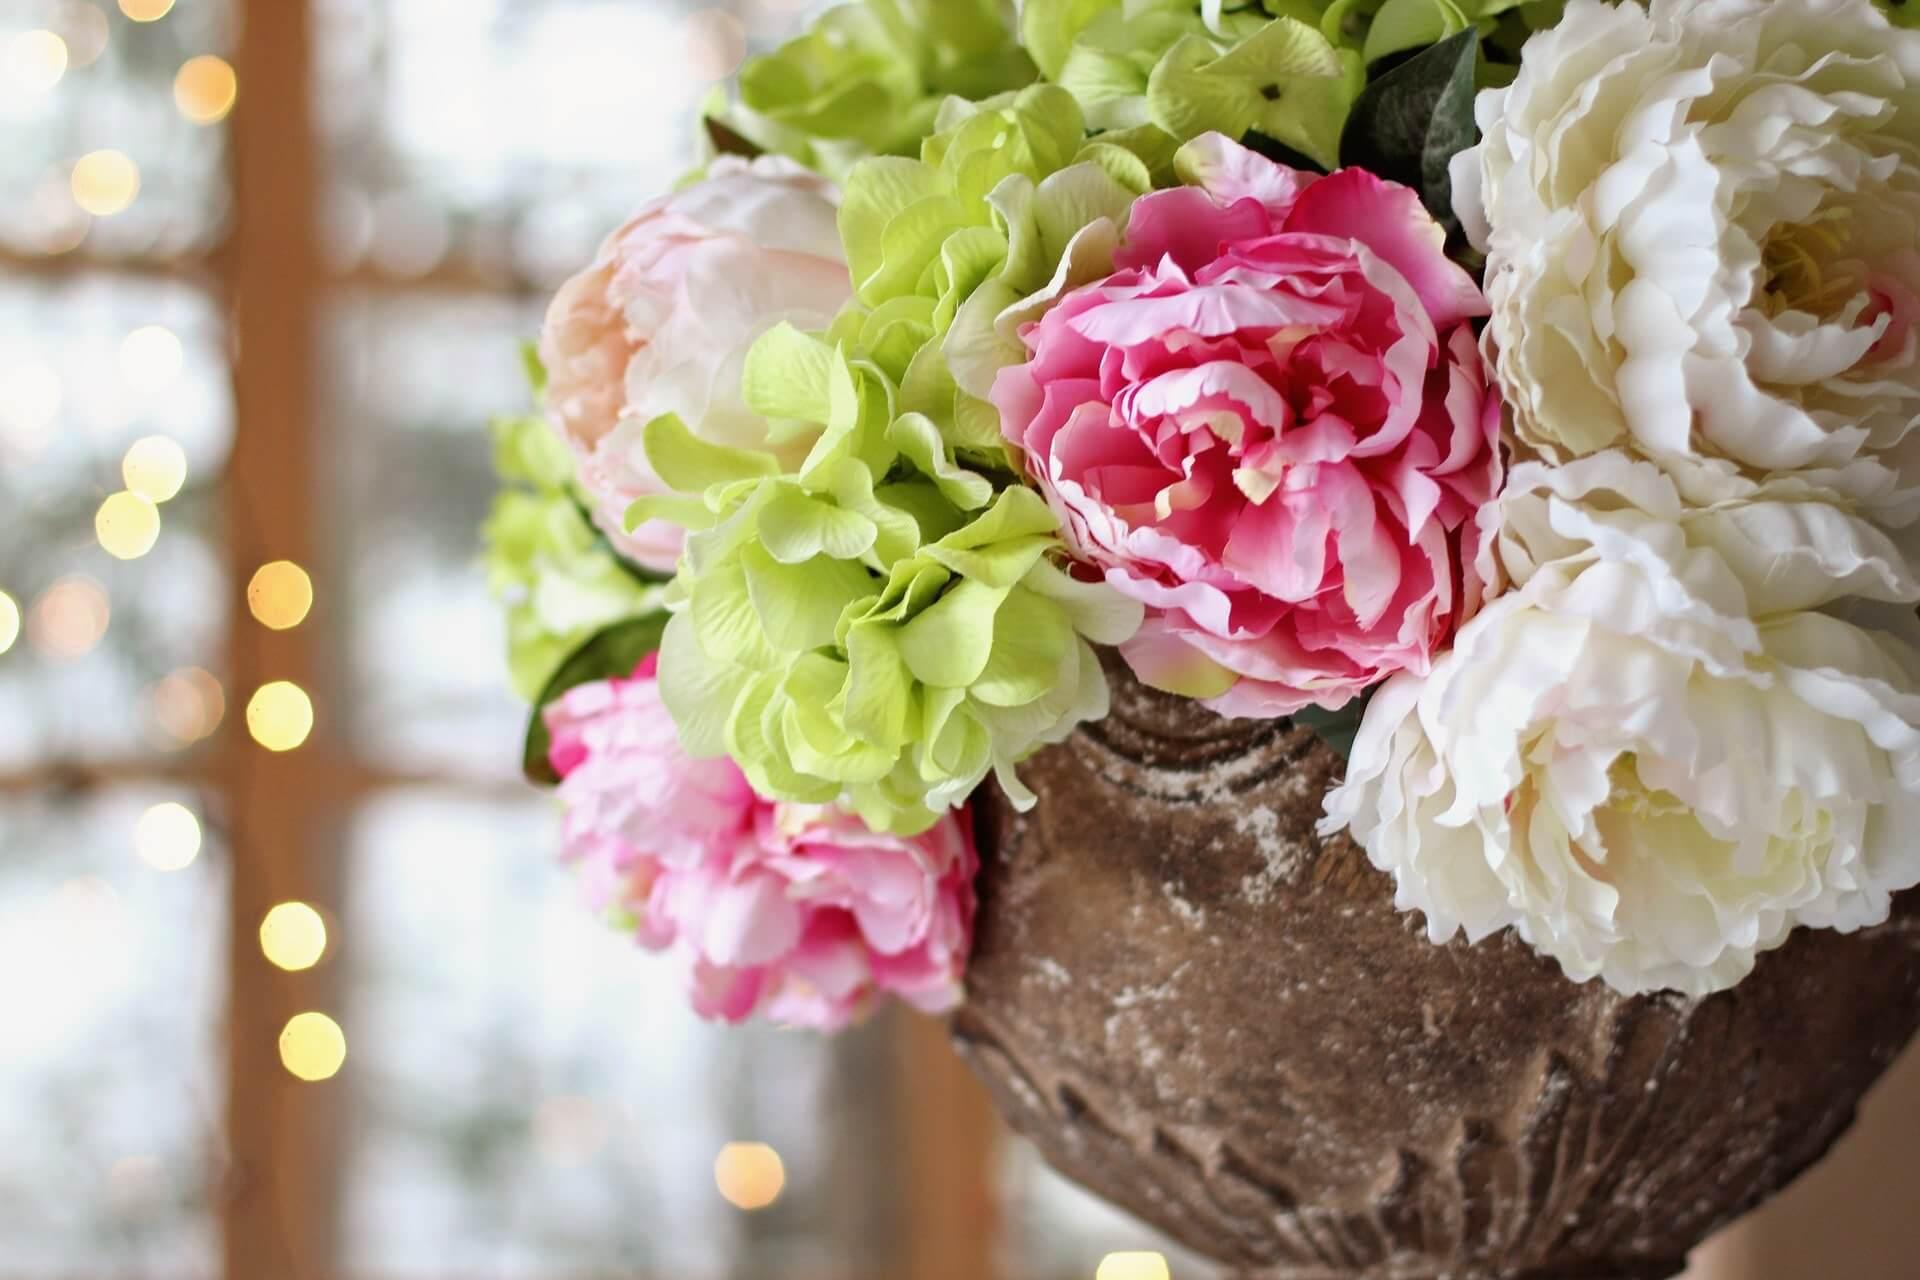 peonies-2044874_1920 花屋の店舗デザインをお考えの方へ!ポイントをご紹介します!